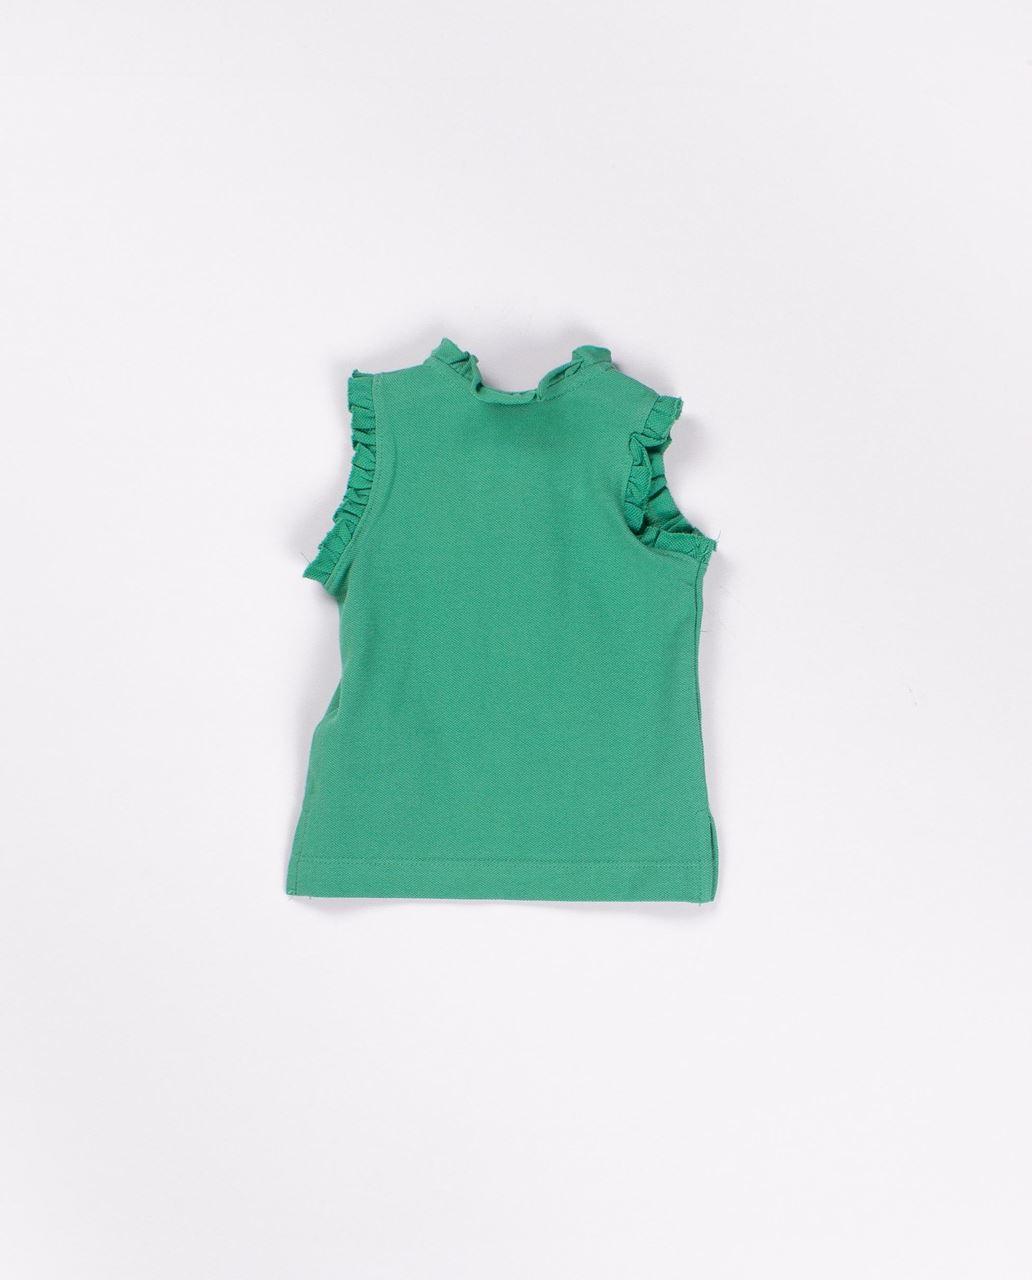 ce6518eab Polo pique de algodon sin mangas niña verde sandia. Dadati Profesionales